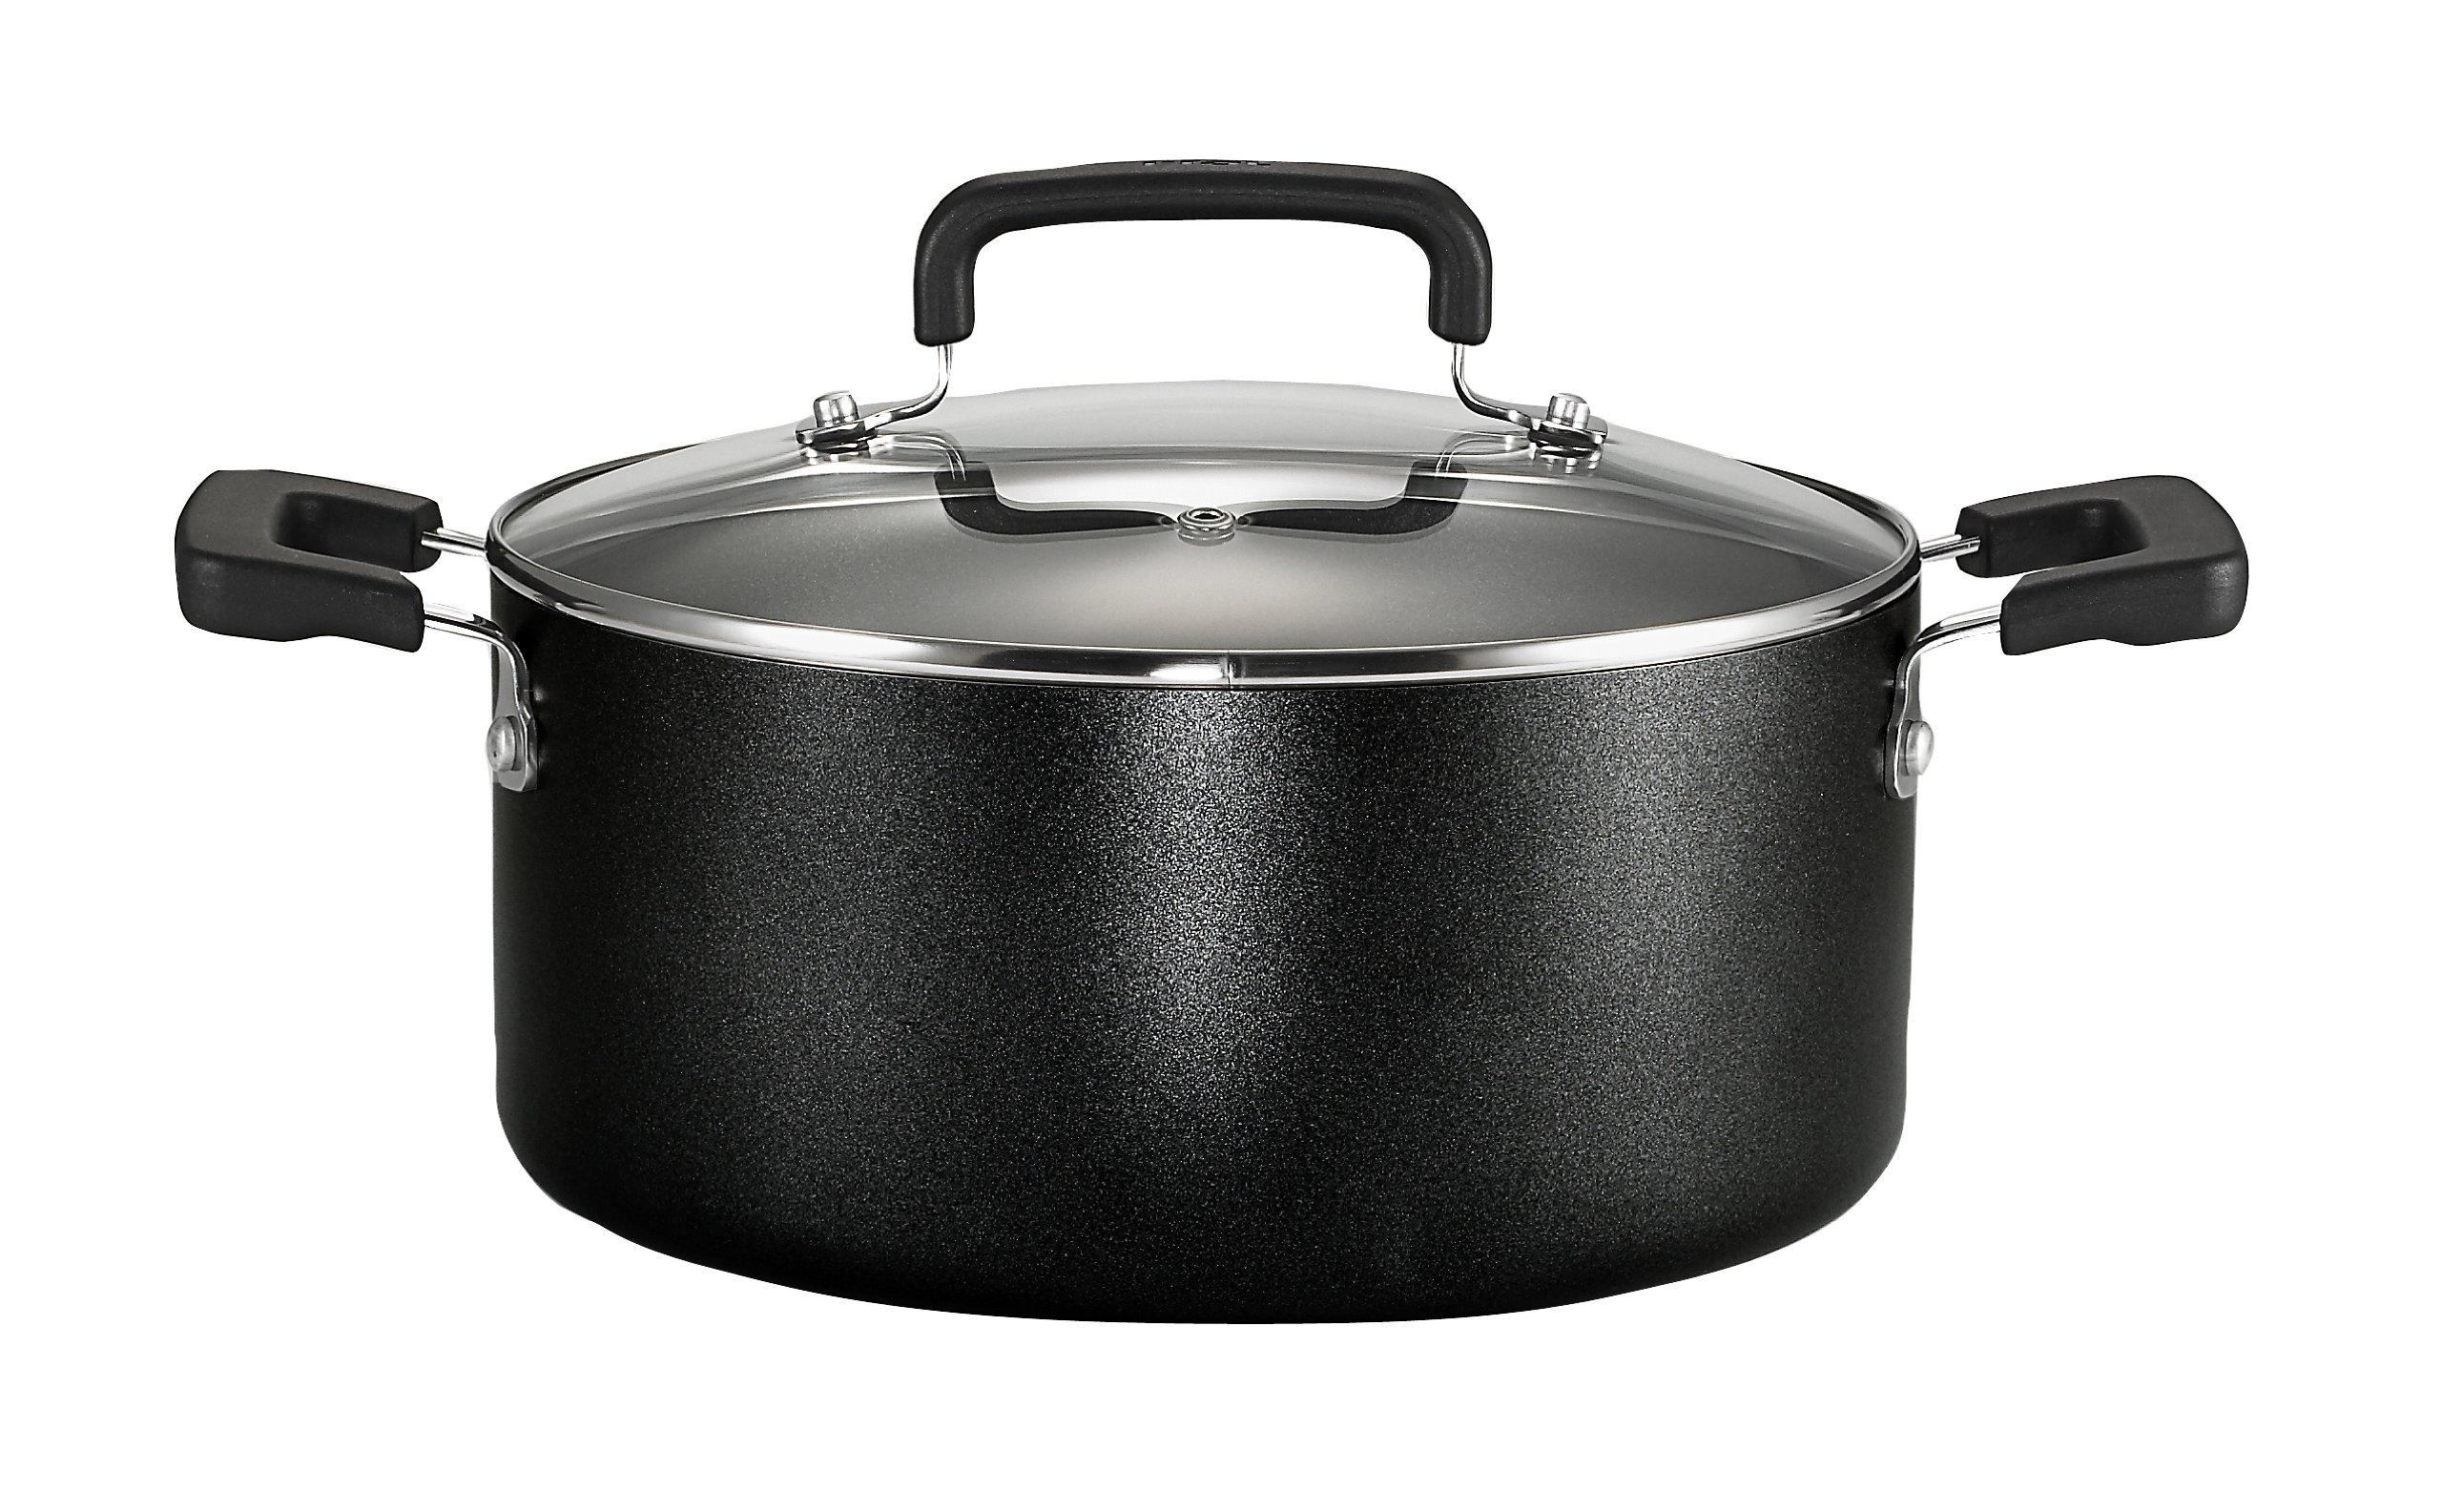 t fal cookware set nonstick pots and pans set 12 piece thermo spot heat 751429331984 ebay. Black Bedroom Furniture Sets. Home Design Ideas